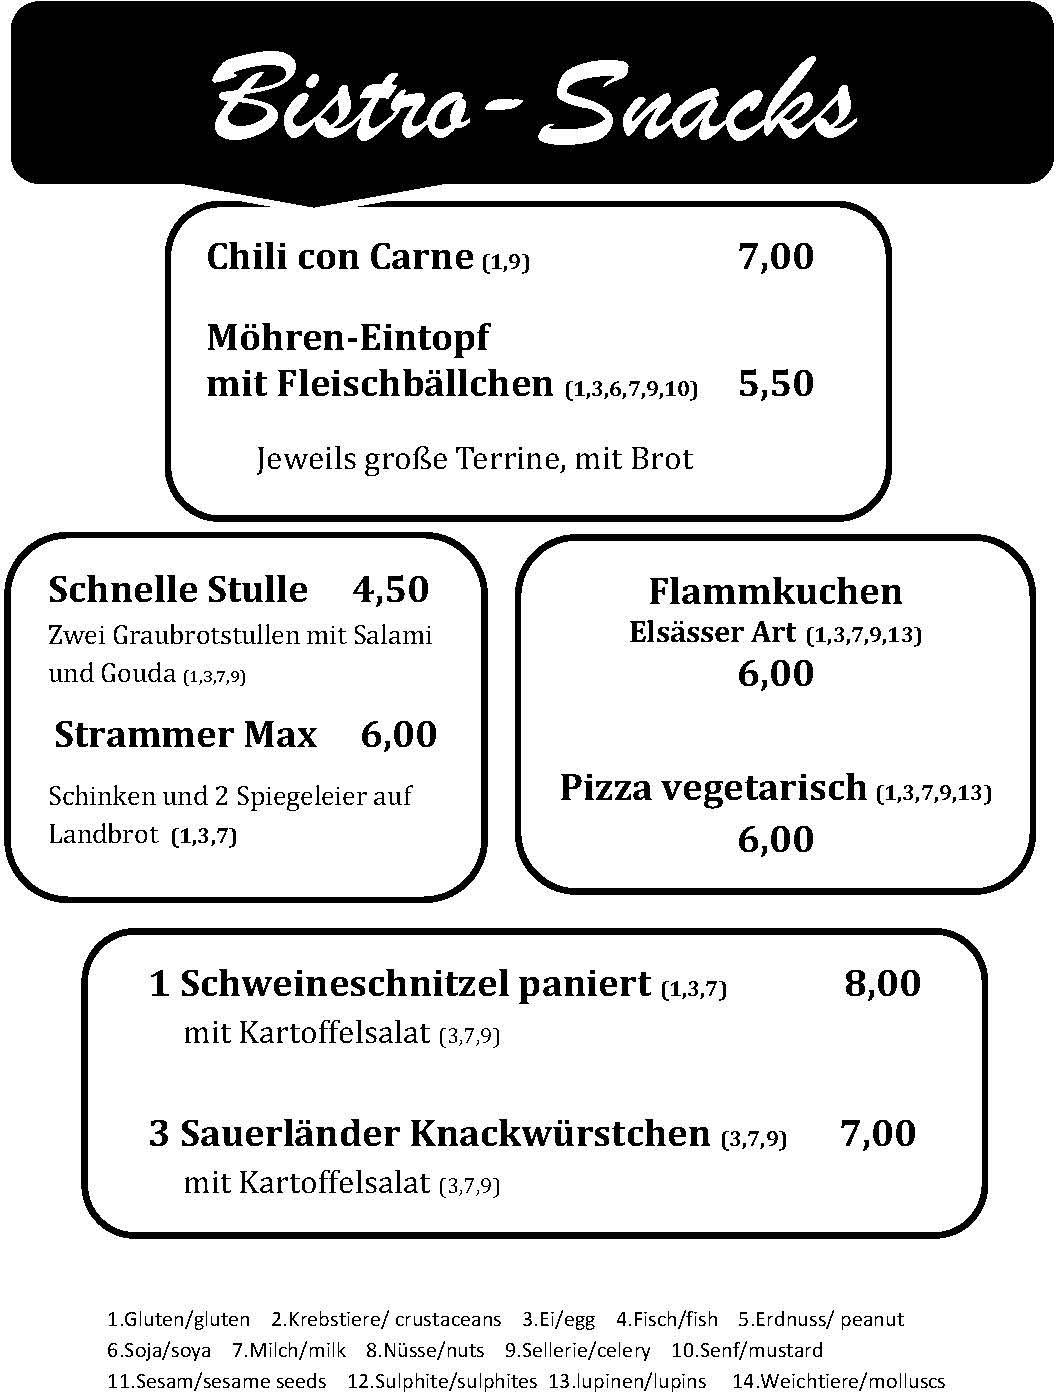 Bistro - Snack-Karte